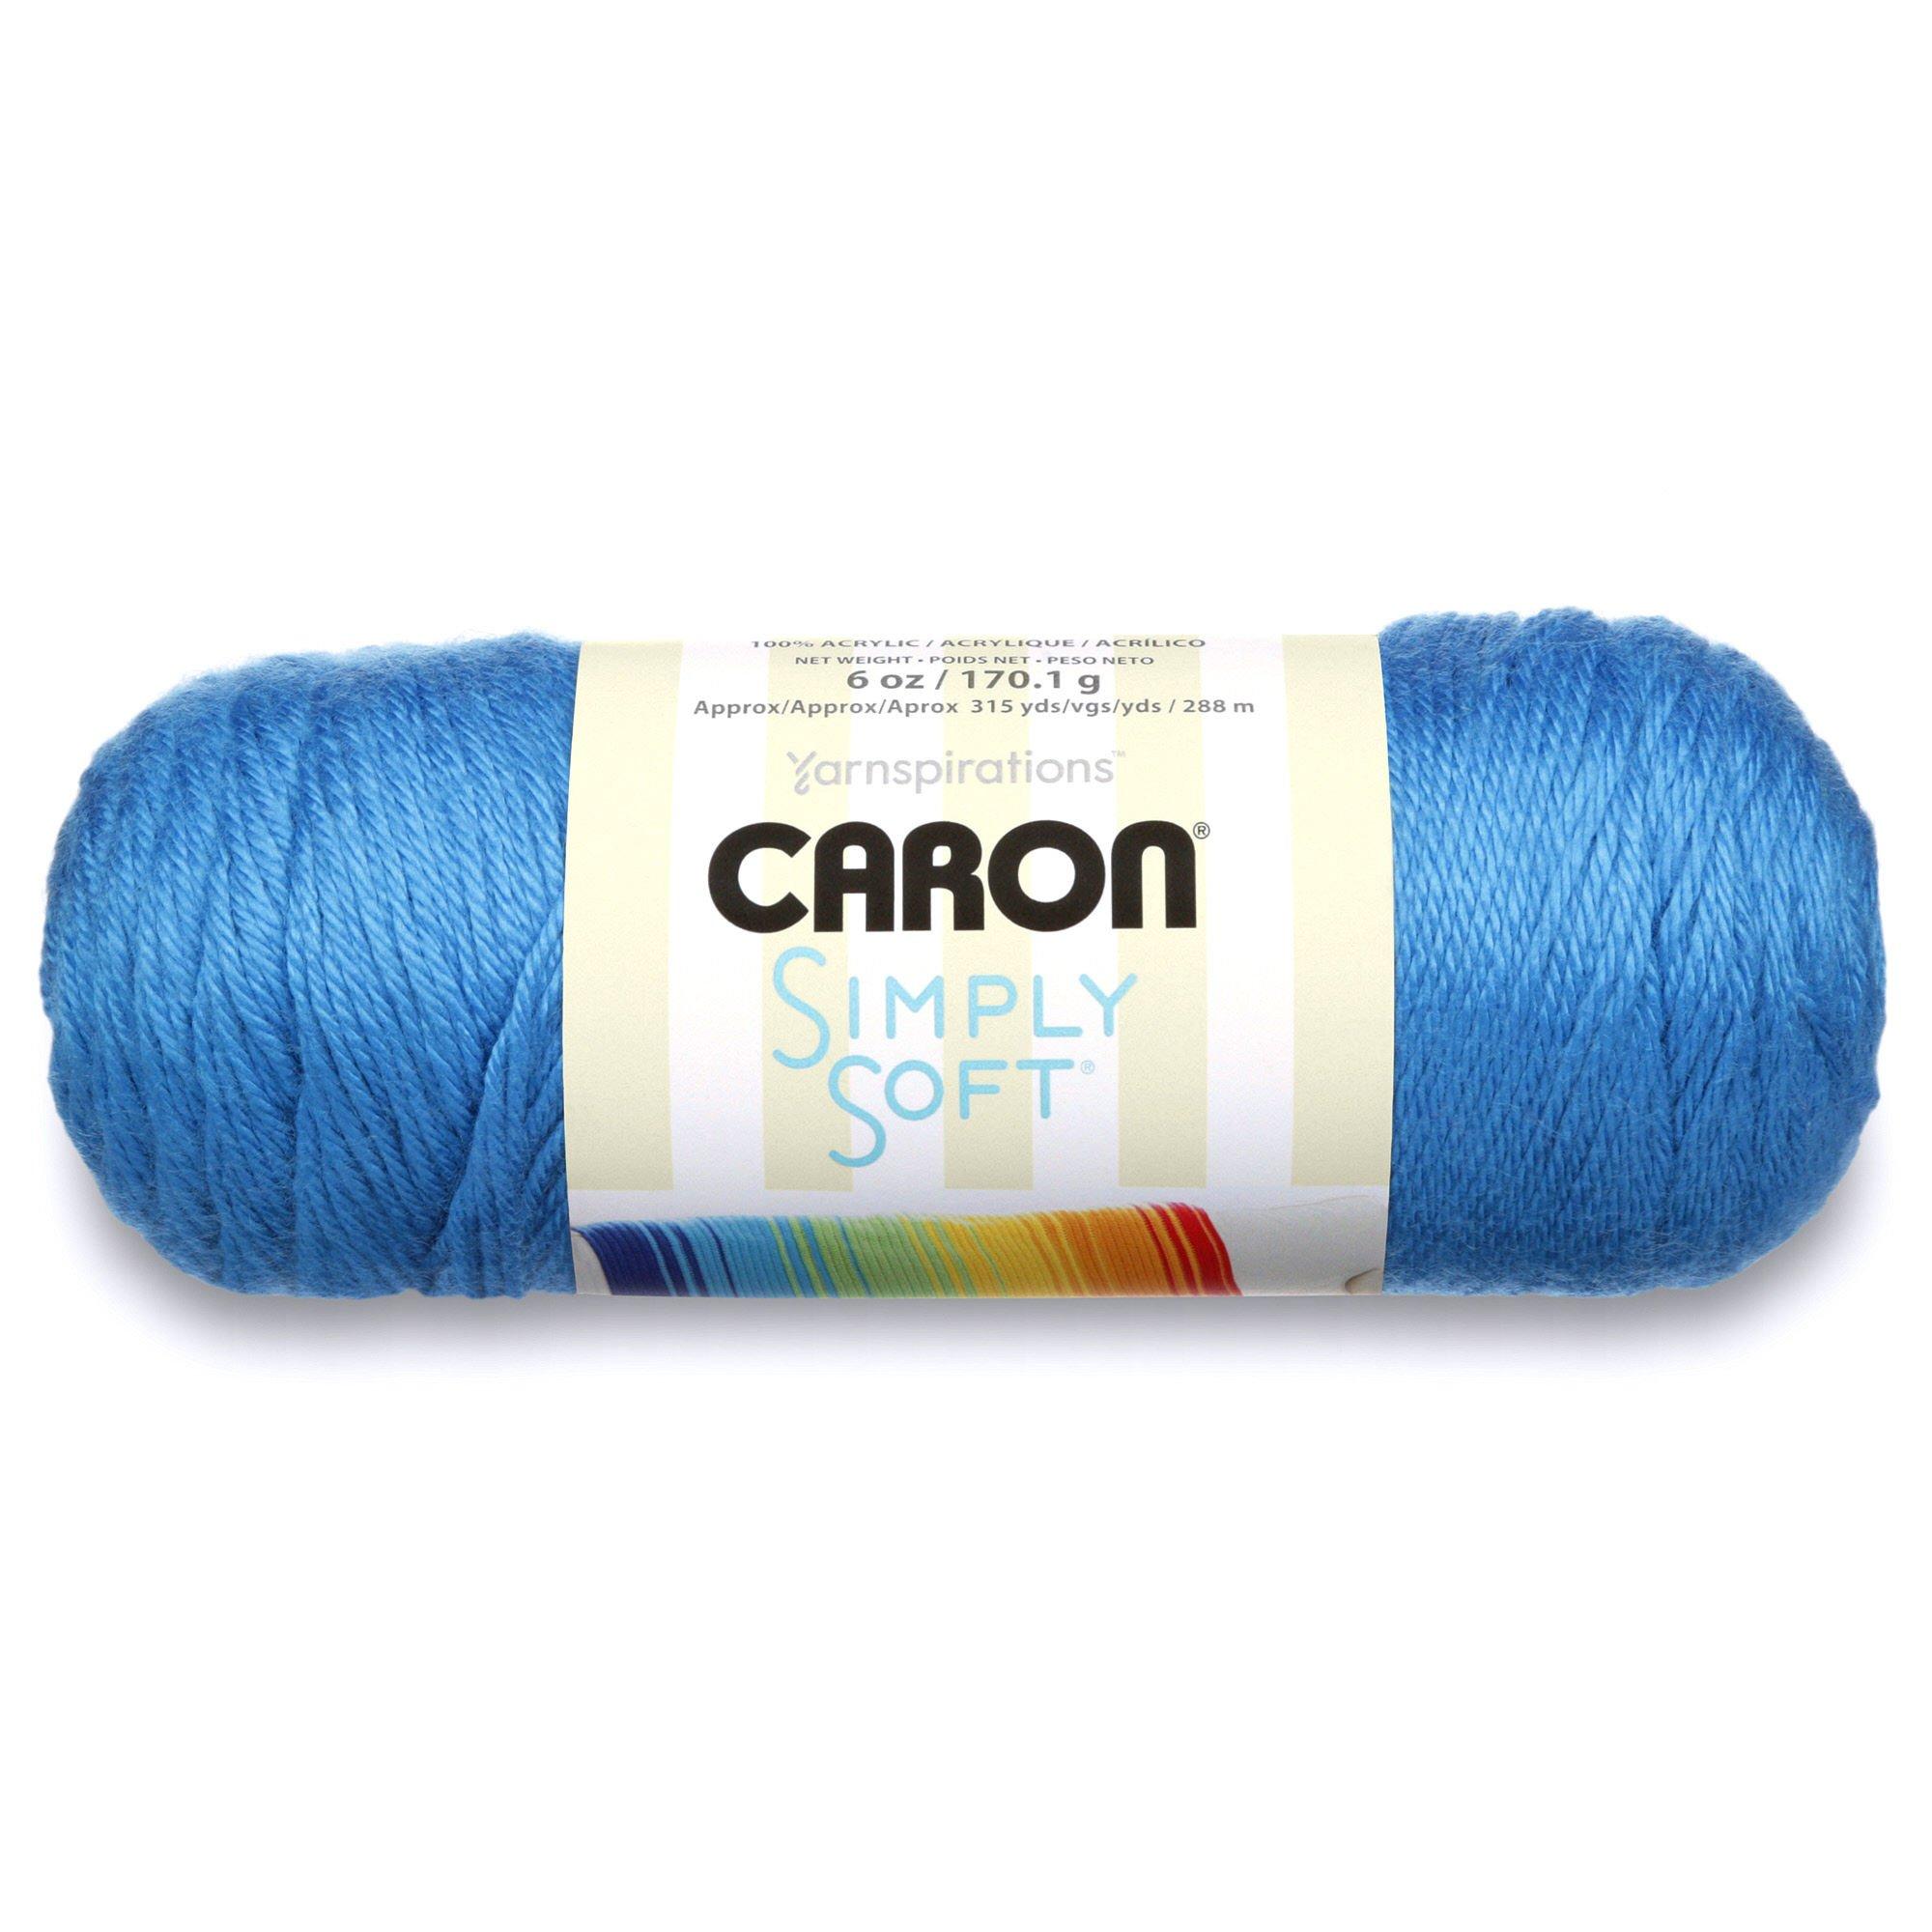 Caron Simply Soft Crochet Patterns Crochet Patterns